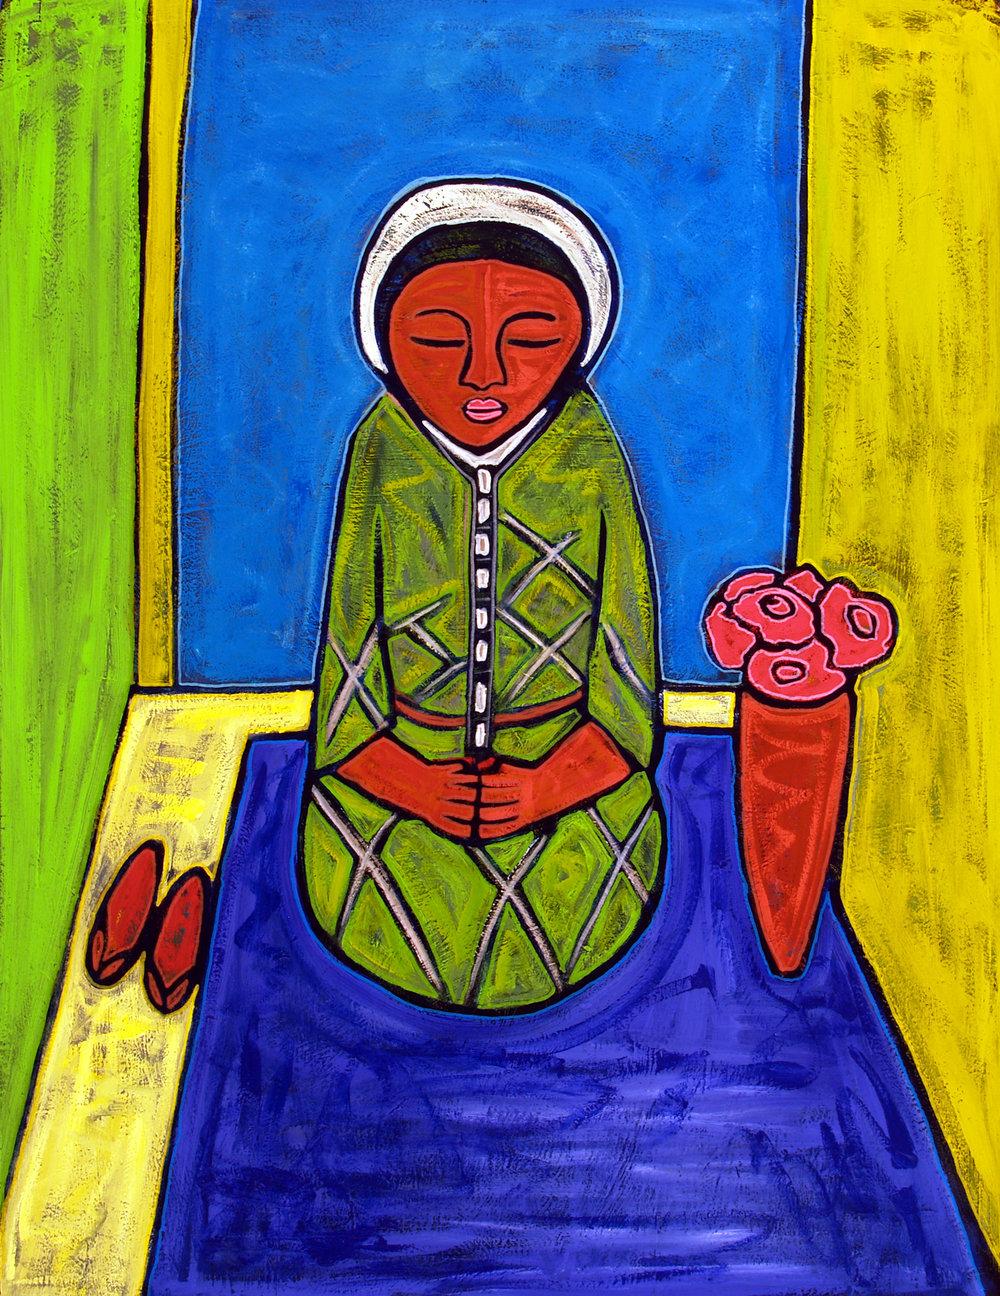 mujer sentada, 2007, 33x40